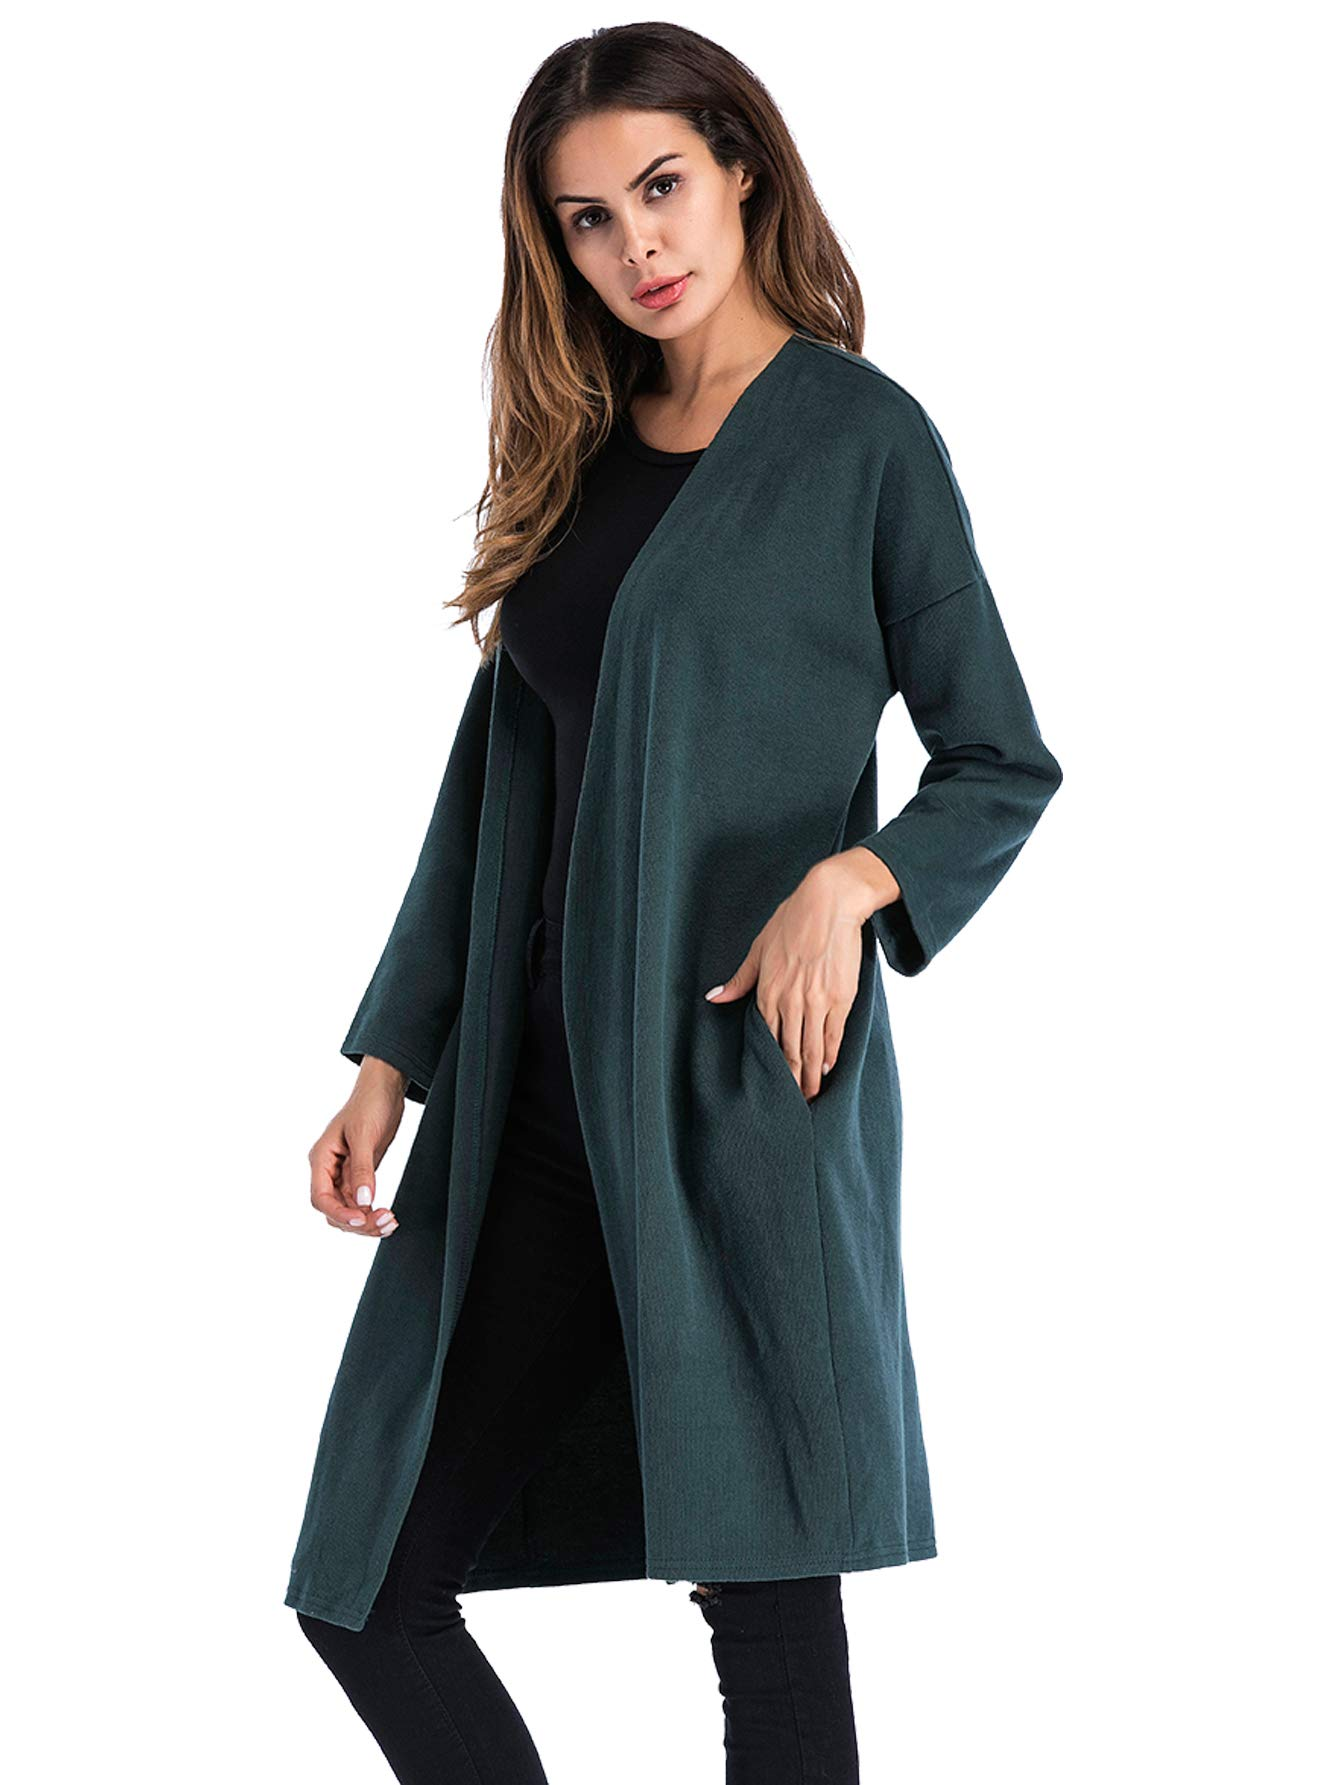 FreeNFond Jackets with Pockets,Fall Cardigan Sweaters Lightweight Tunic Outwear Green